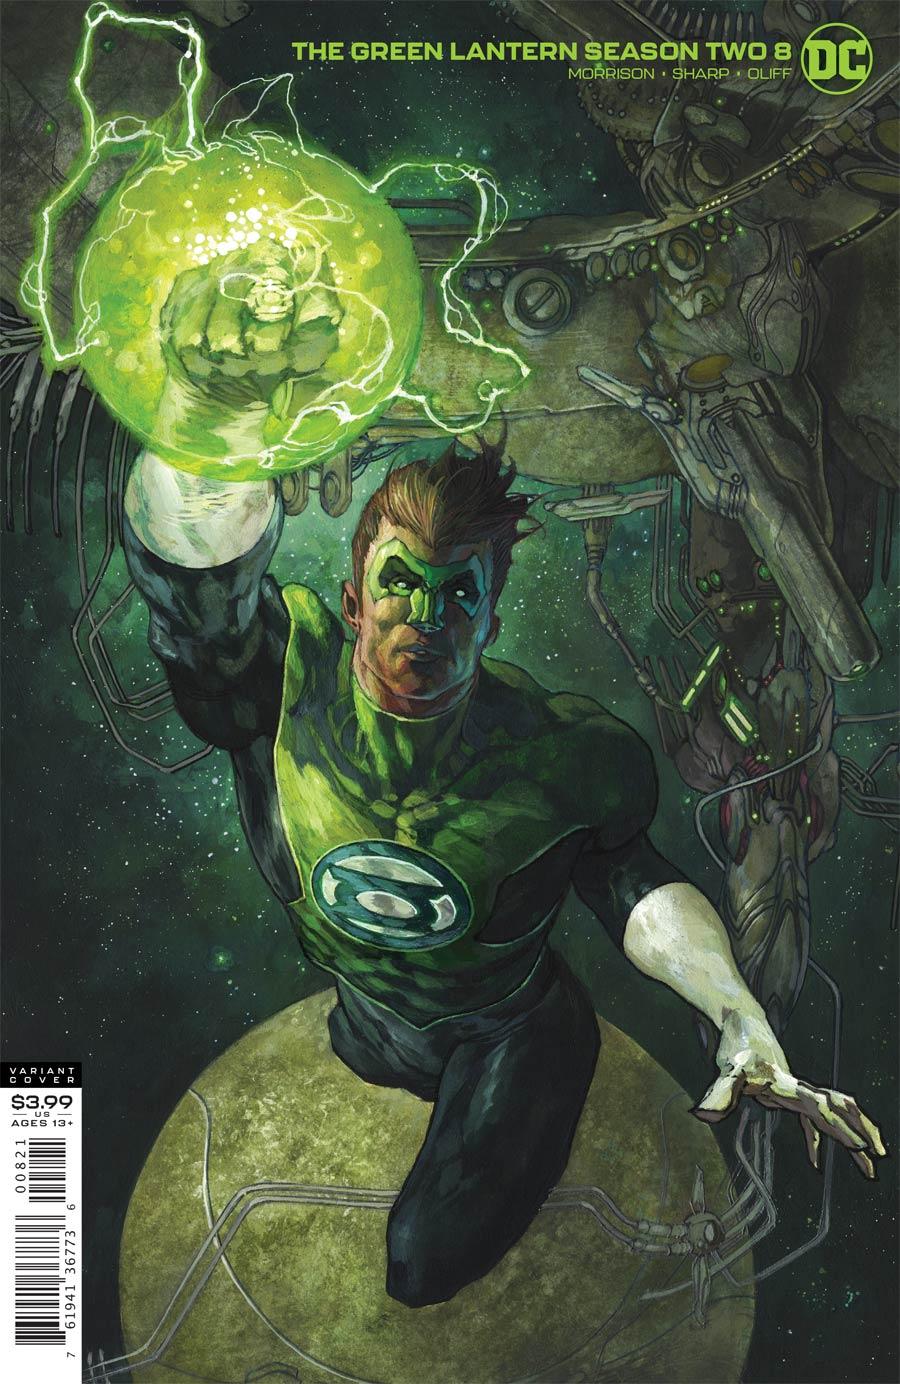 Green Lantern Vol 6 Season 2 #8 Cover B Variant Simone Bianchi Cover